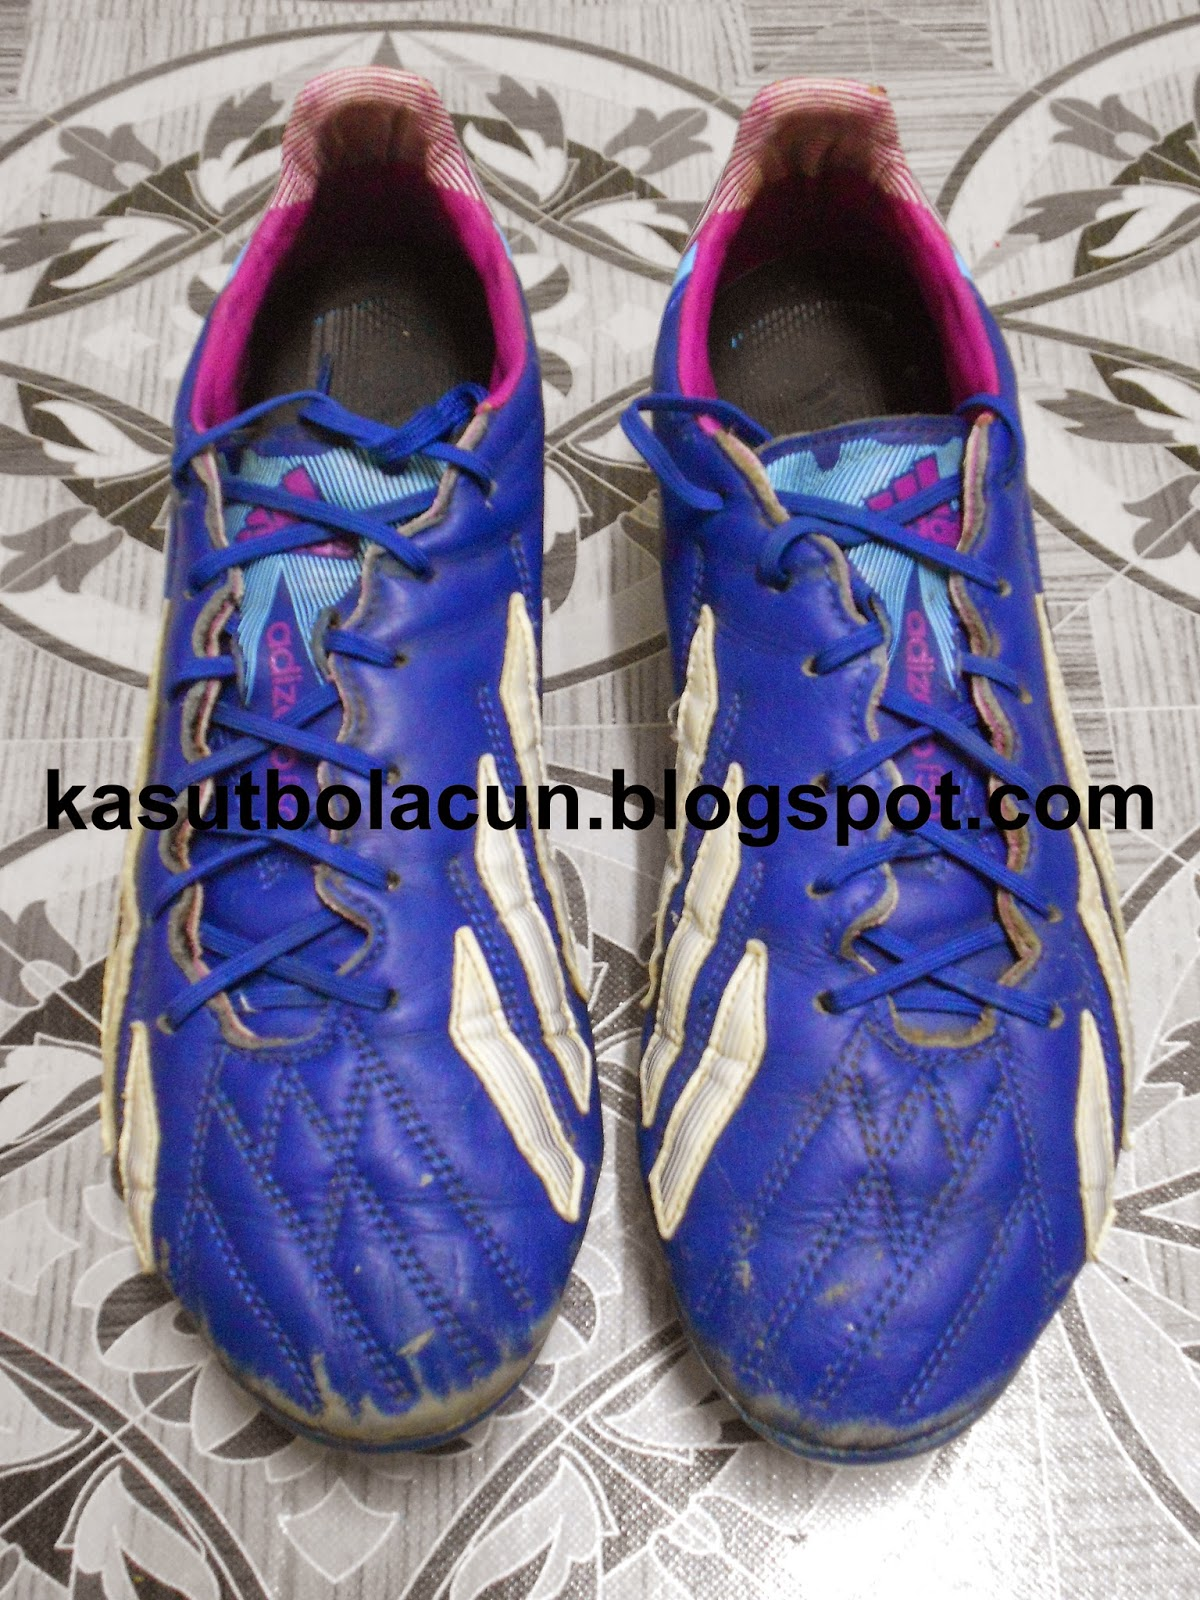 http://kasutbolacun.blogspot.com/2015/02/adidas-f50-adizero-micoach-2-sg.html